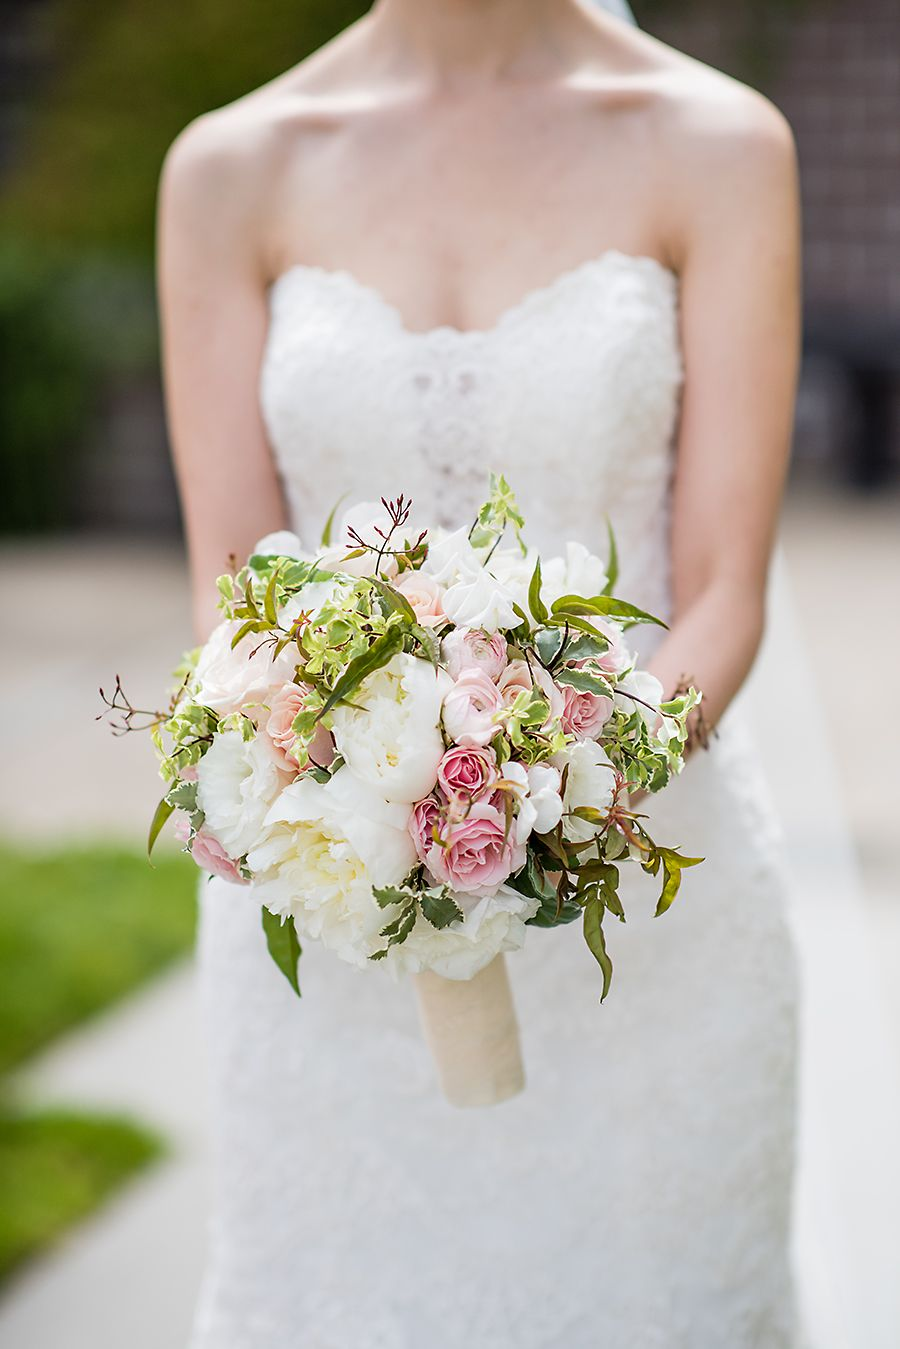 Classic creamy white pink rose jasmine vine green bridal classic creamy white pink rose jasmine vine green bridal bouquet bride izmirmasajfo